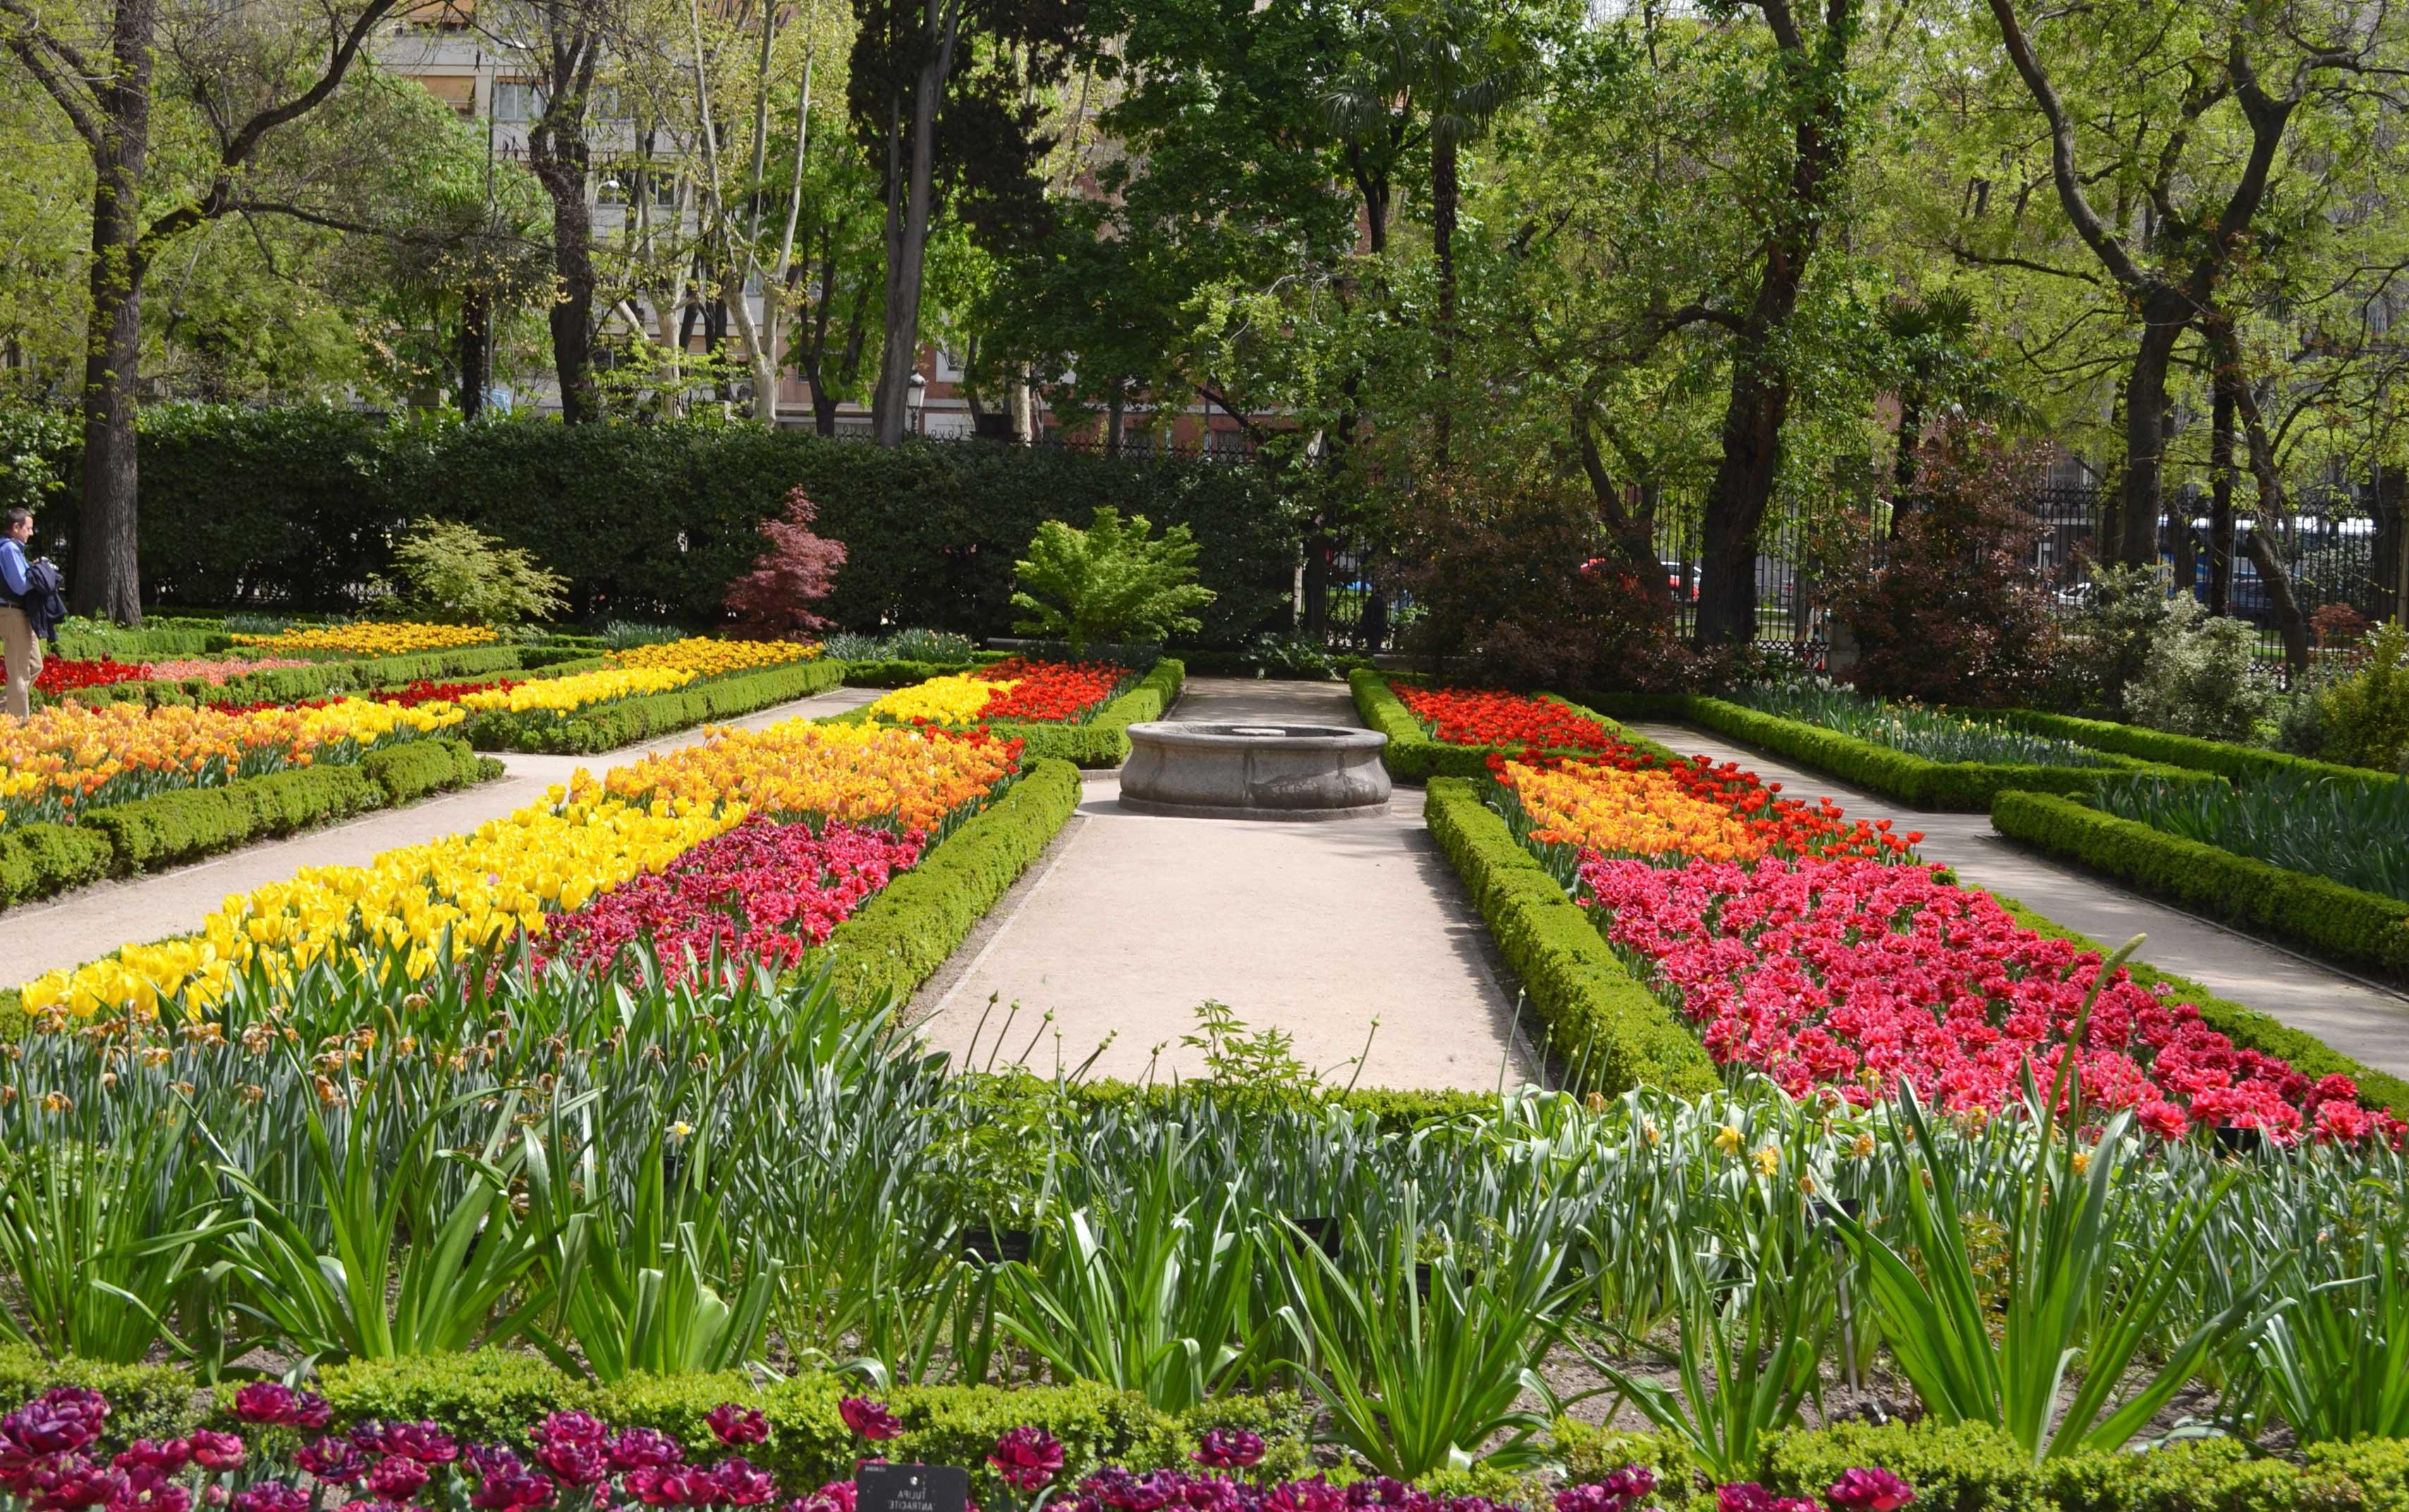 Jardines del botanico